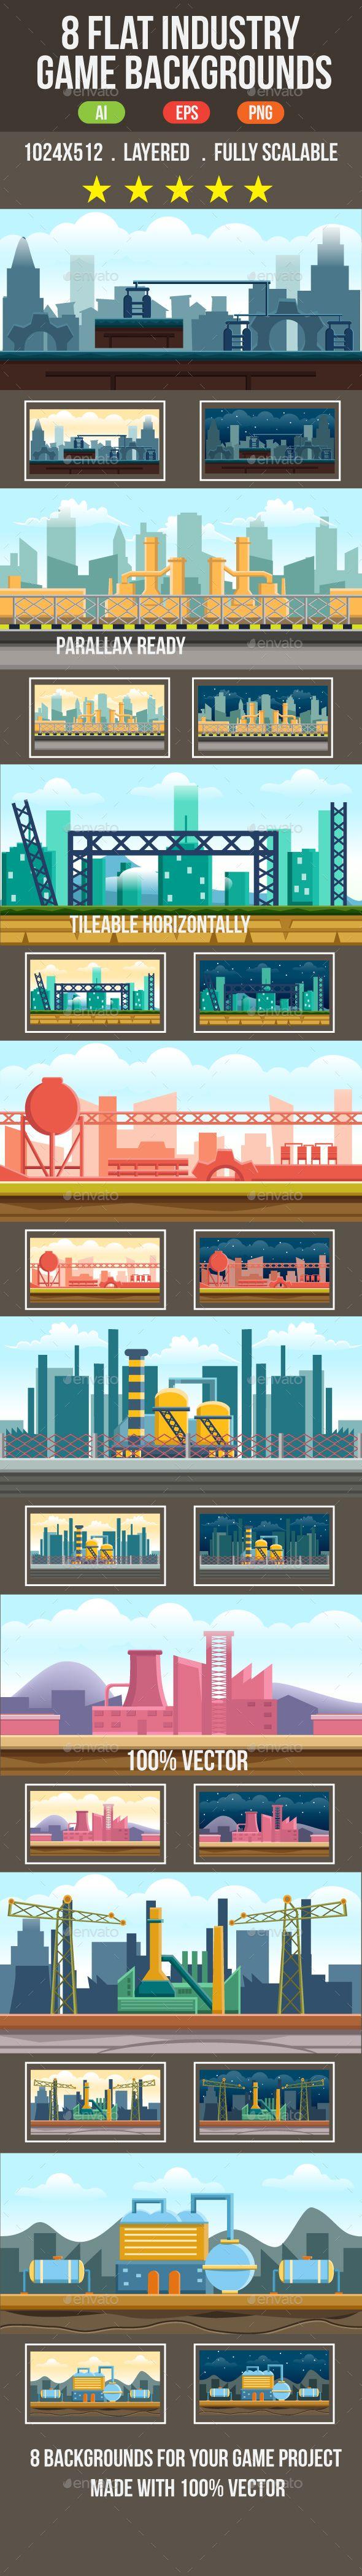 8 Flat Industrial Game Backgrounds Download here: https://graphicriver.net/item/8-flat-industrial-game-backgrounds/18889650?ref=KlitVogli